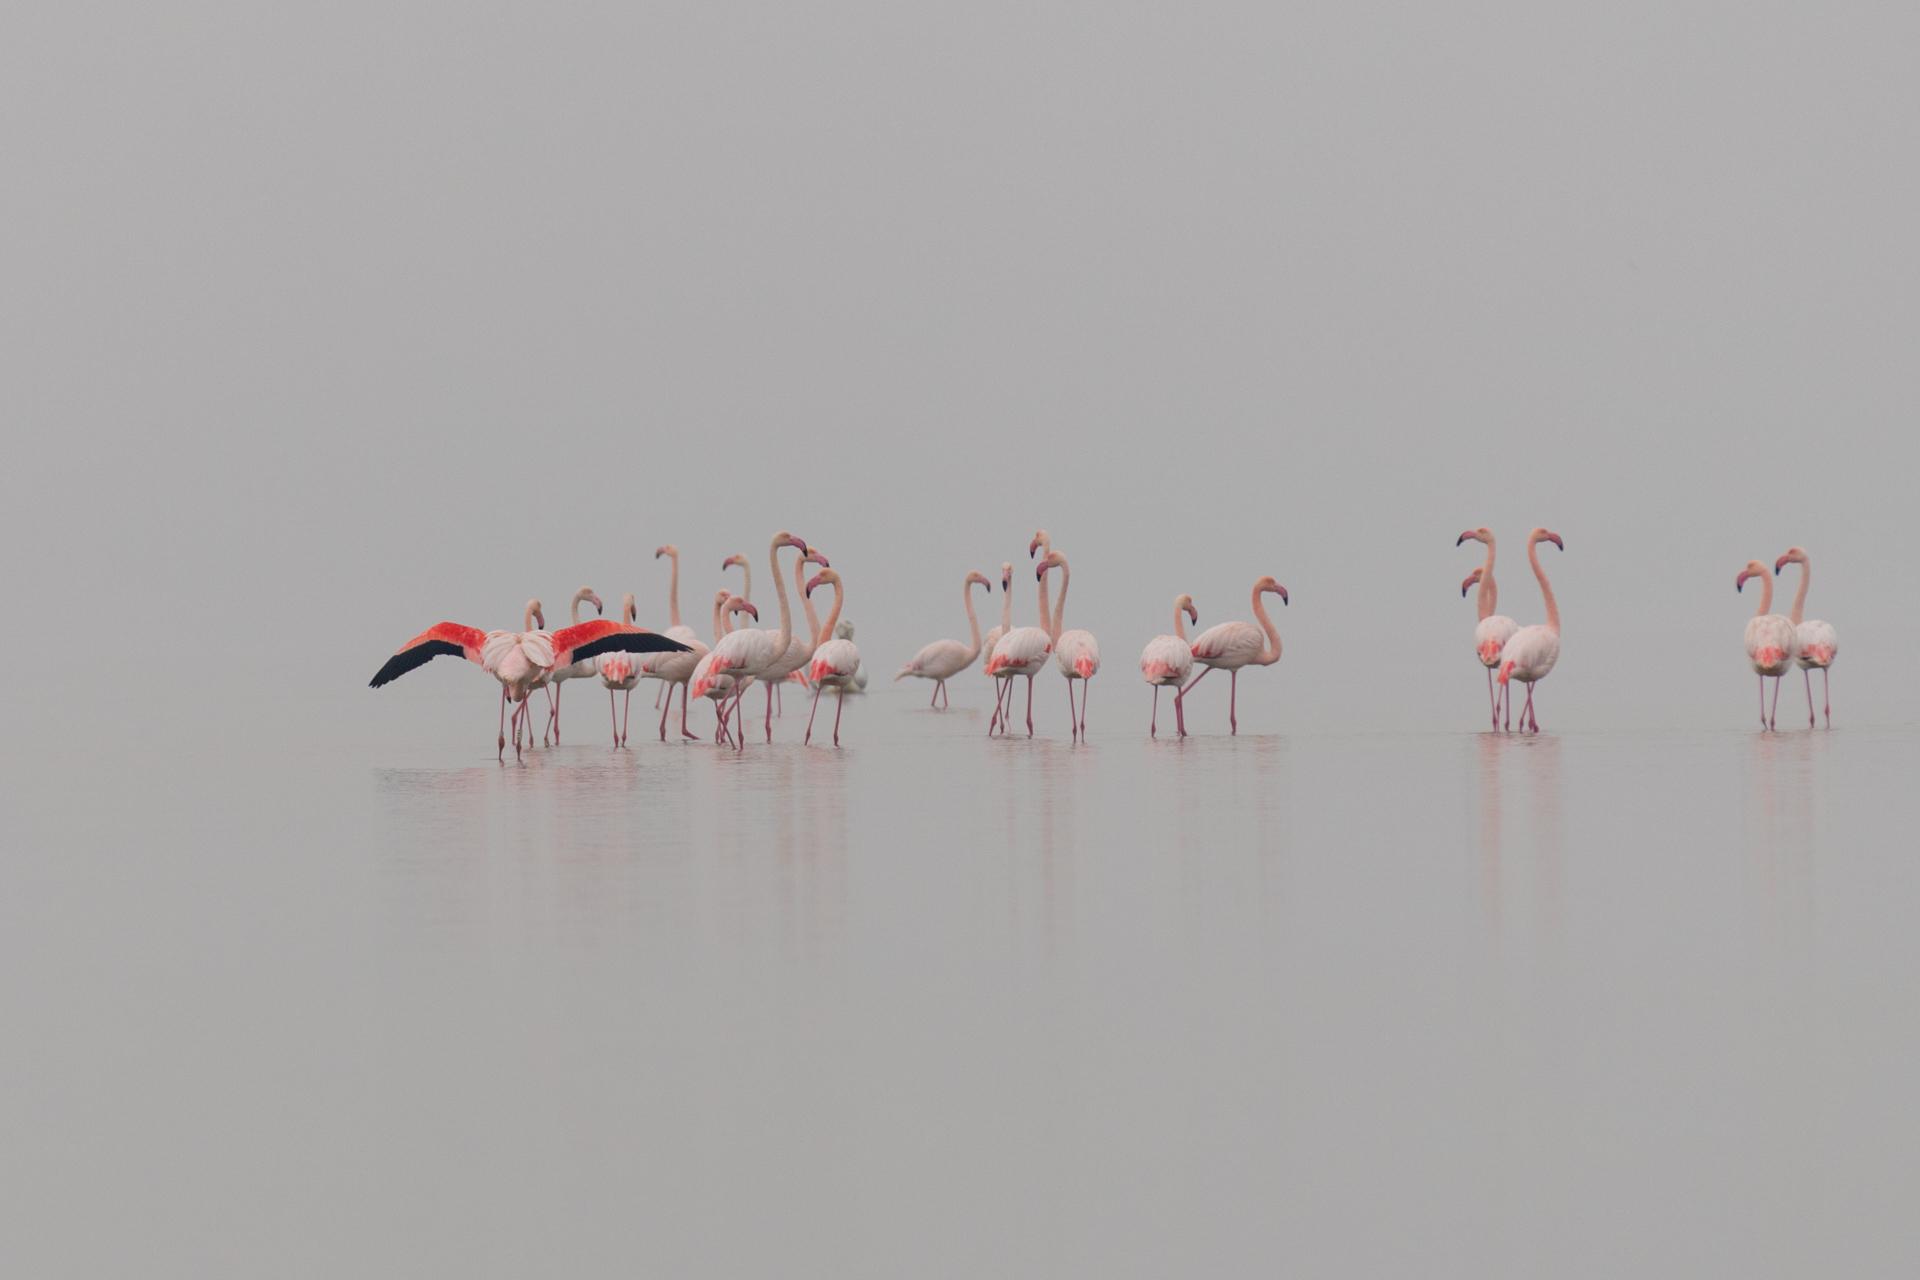 Flamingi / Flamingos, Kerkini Lake 2018 - 2